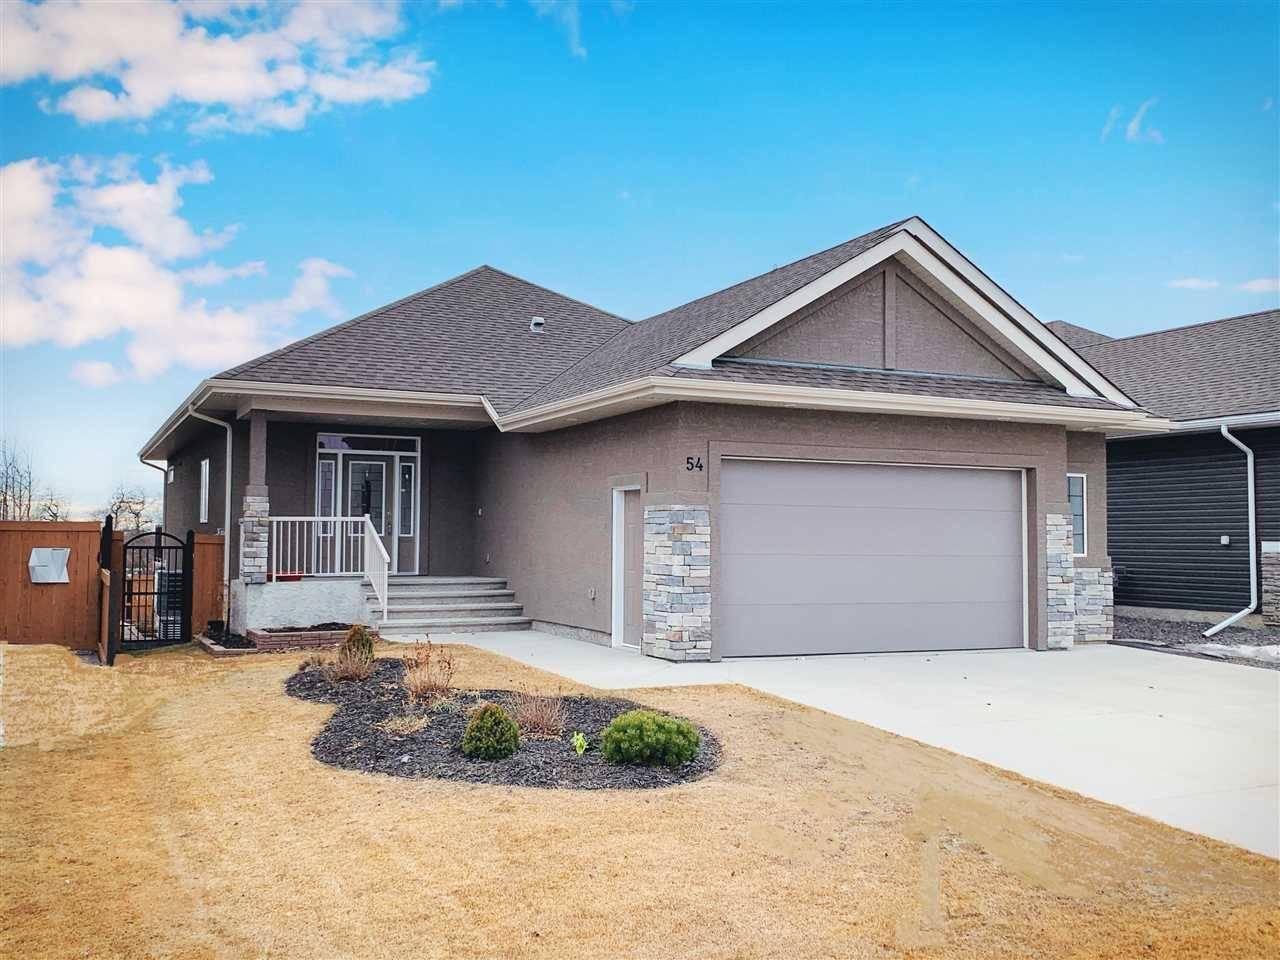 House for sale at 54 Newgate Wy St. Albert Alberta - MLS: E4190046